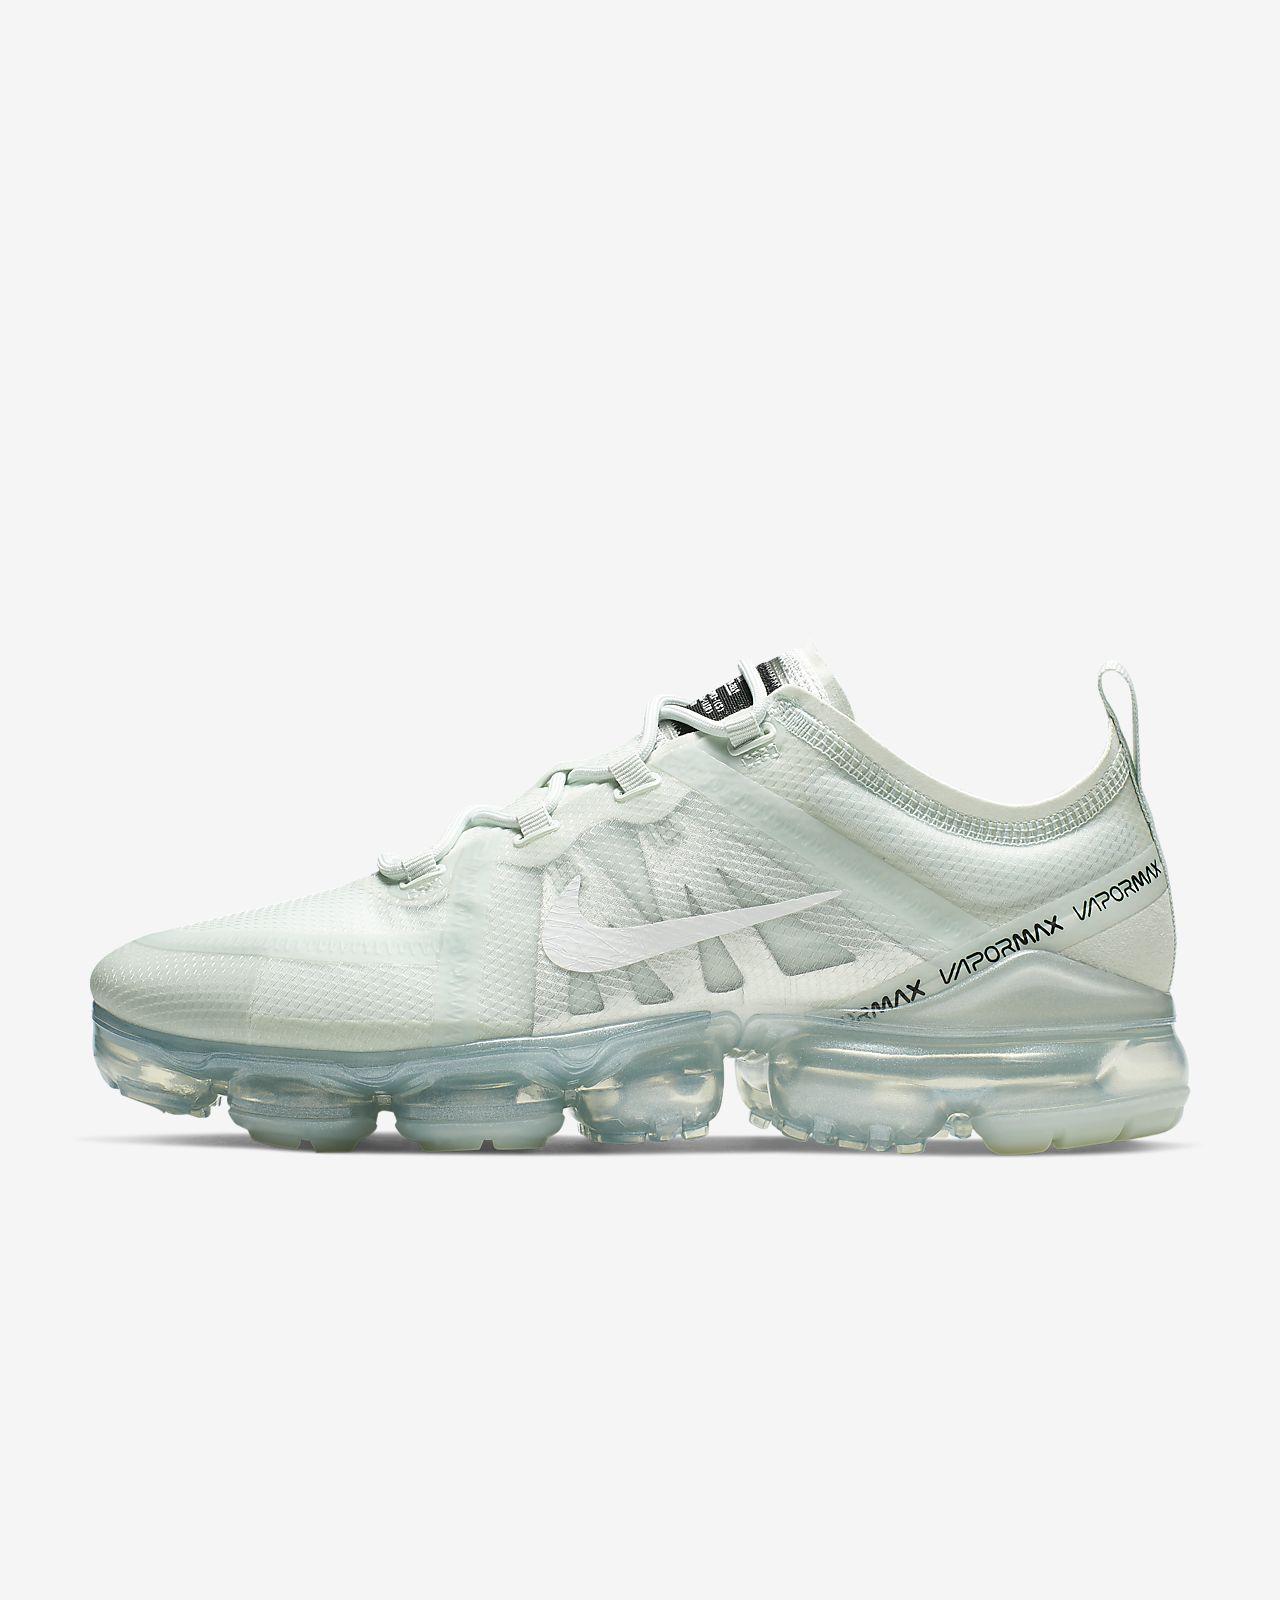 0887e1e37c79 Nike Air VaporMax 2019 Shoe. Nike.com